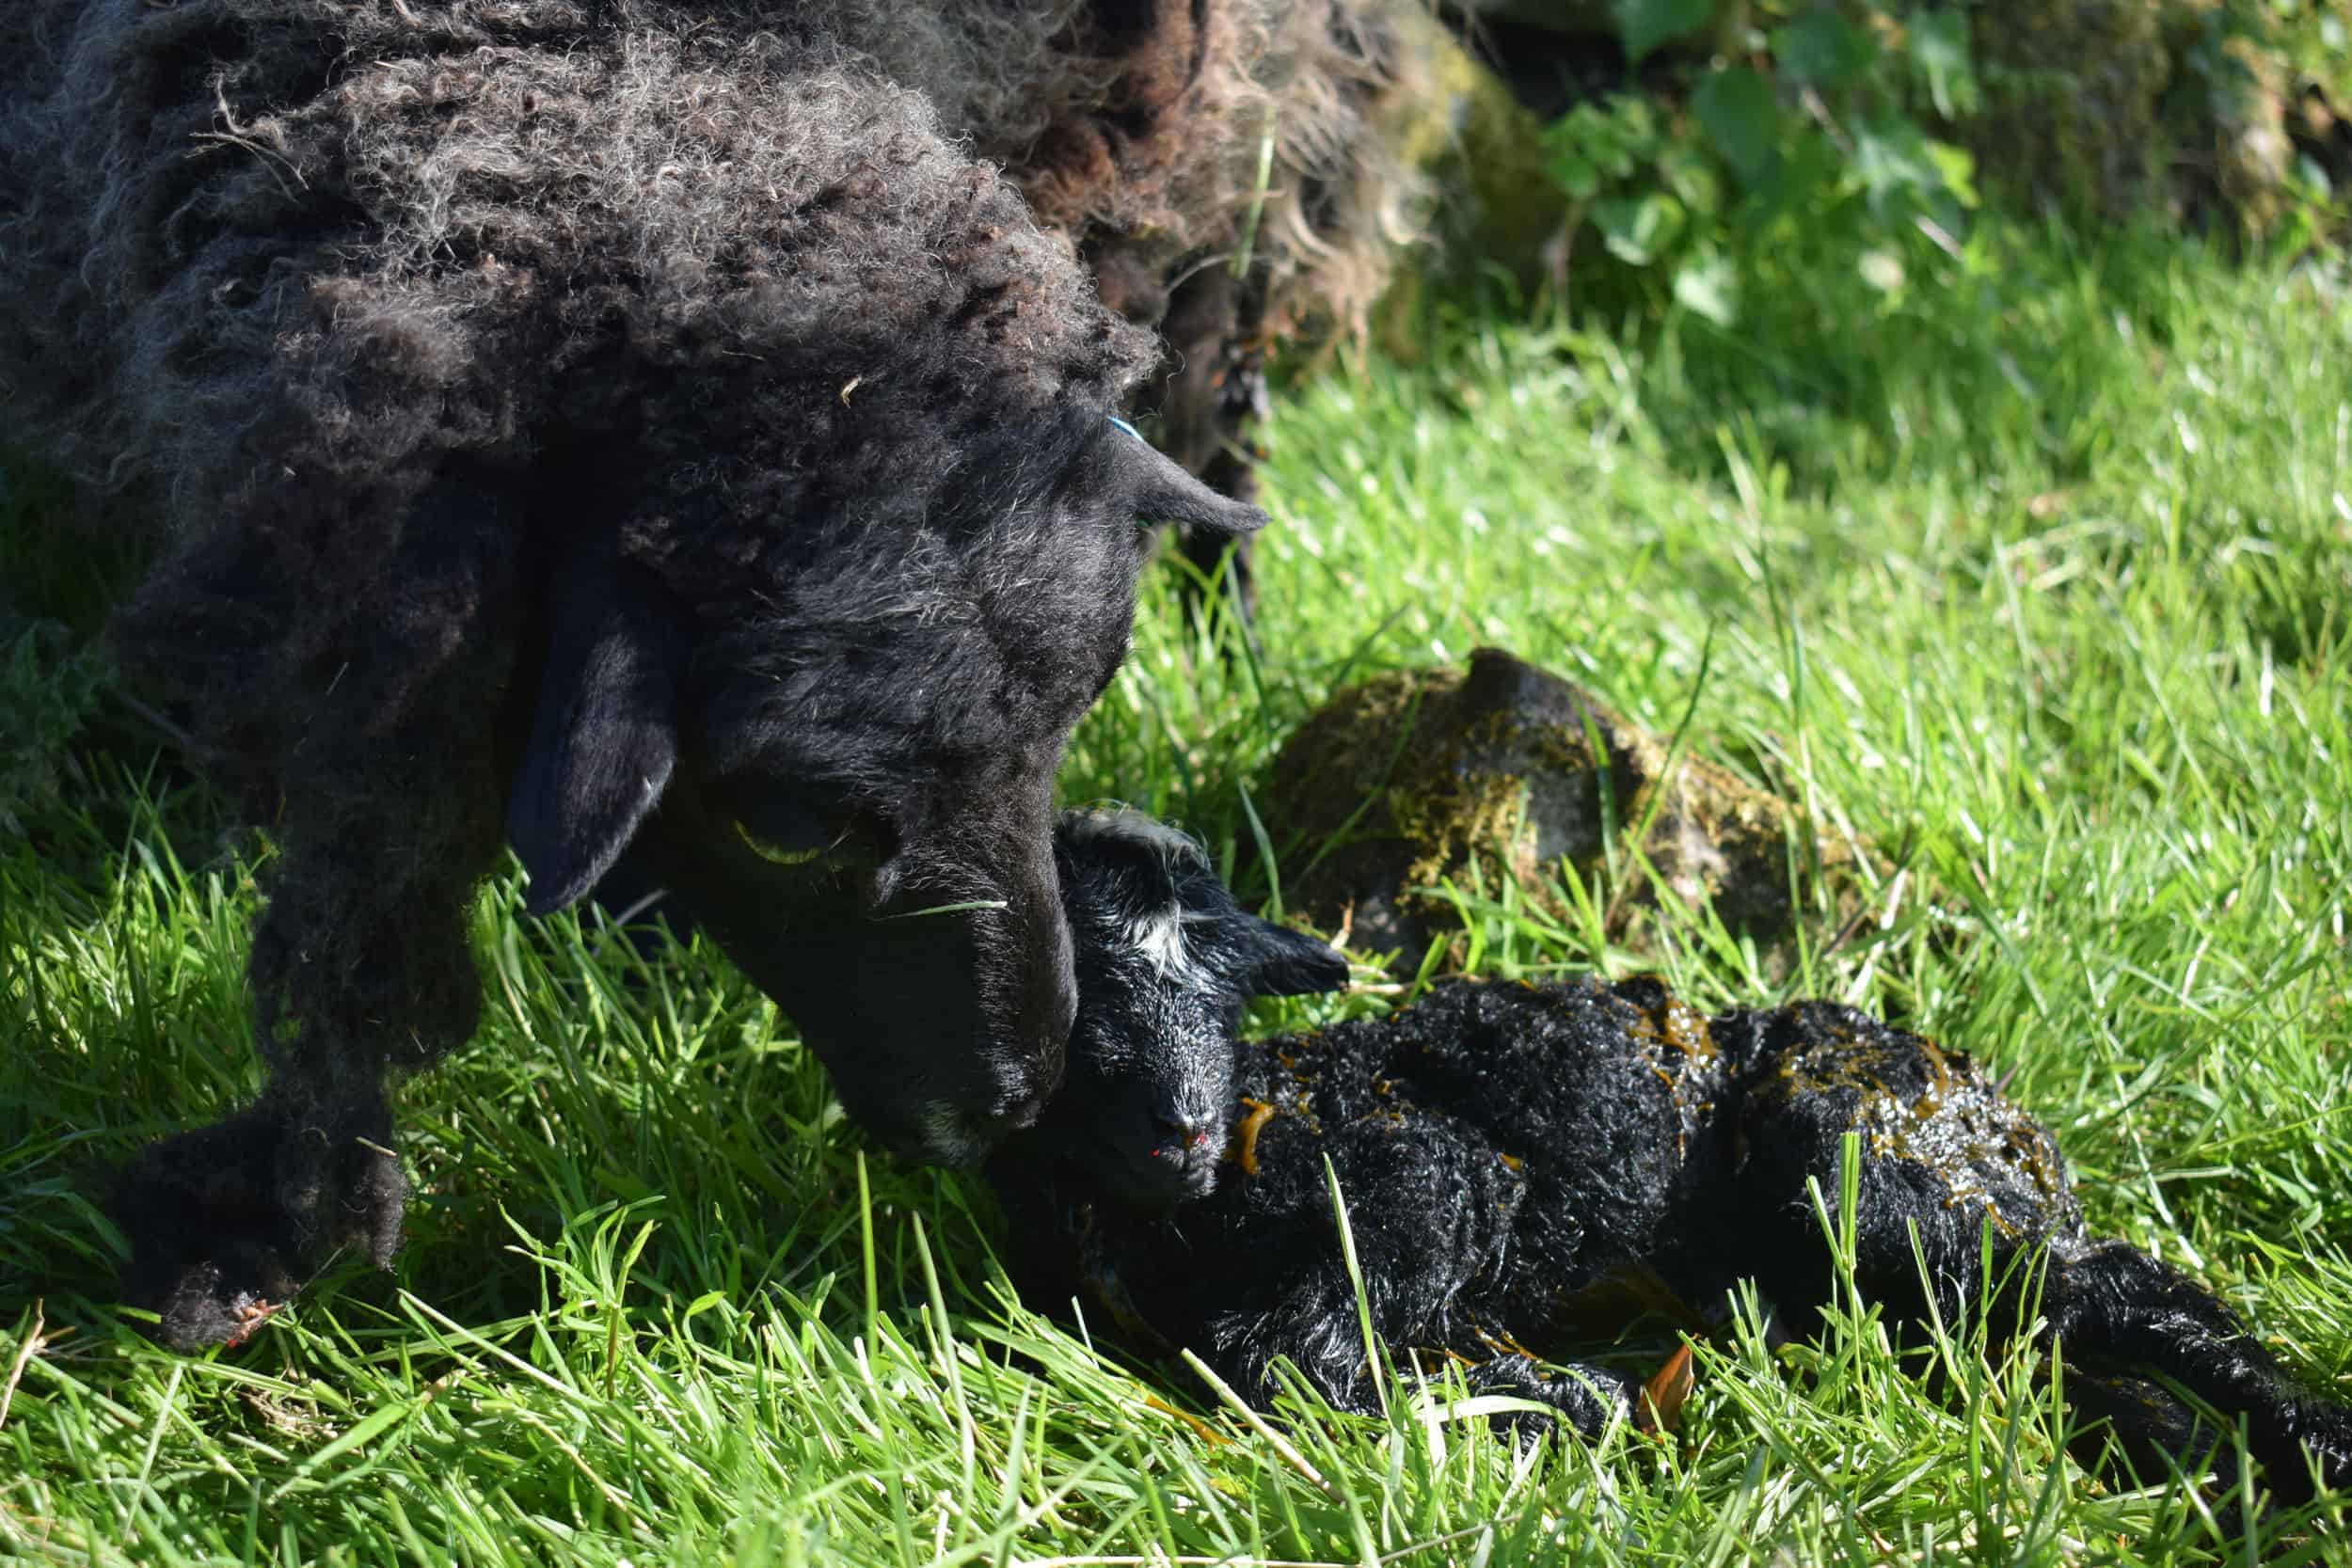 Currant black shetland sheep grandma kind fibre wool crafts raisin old mum